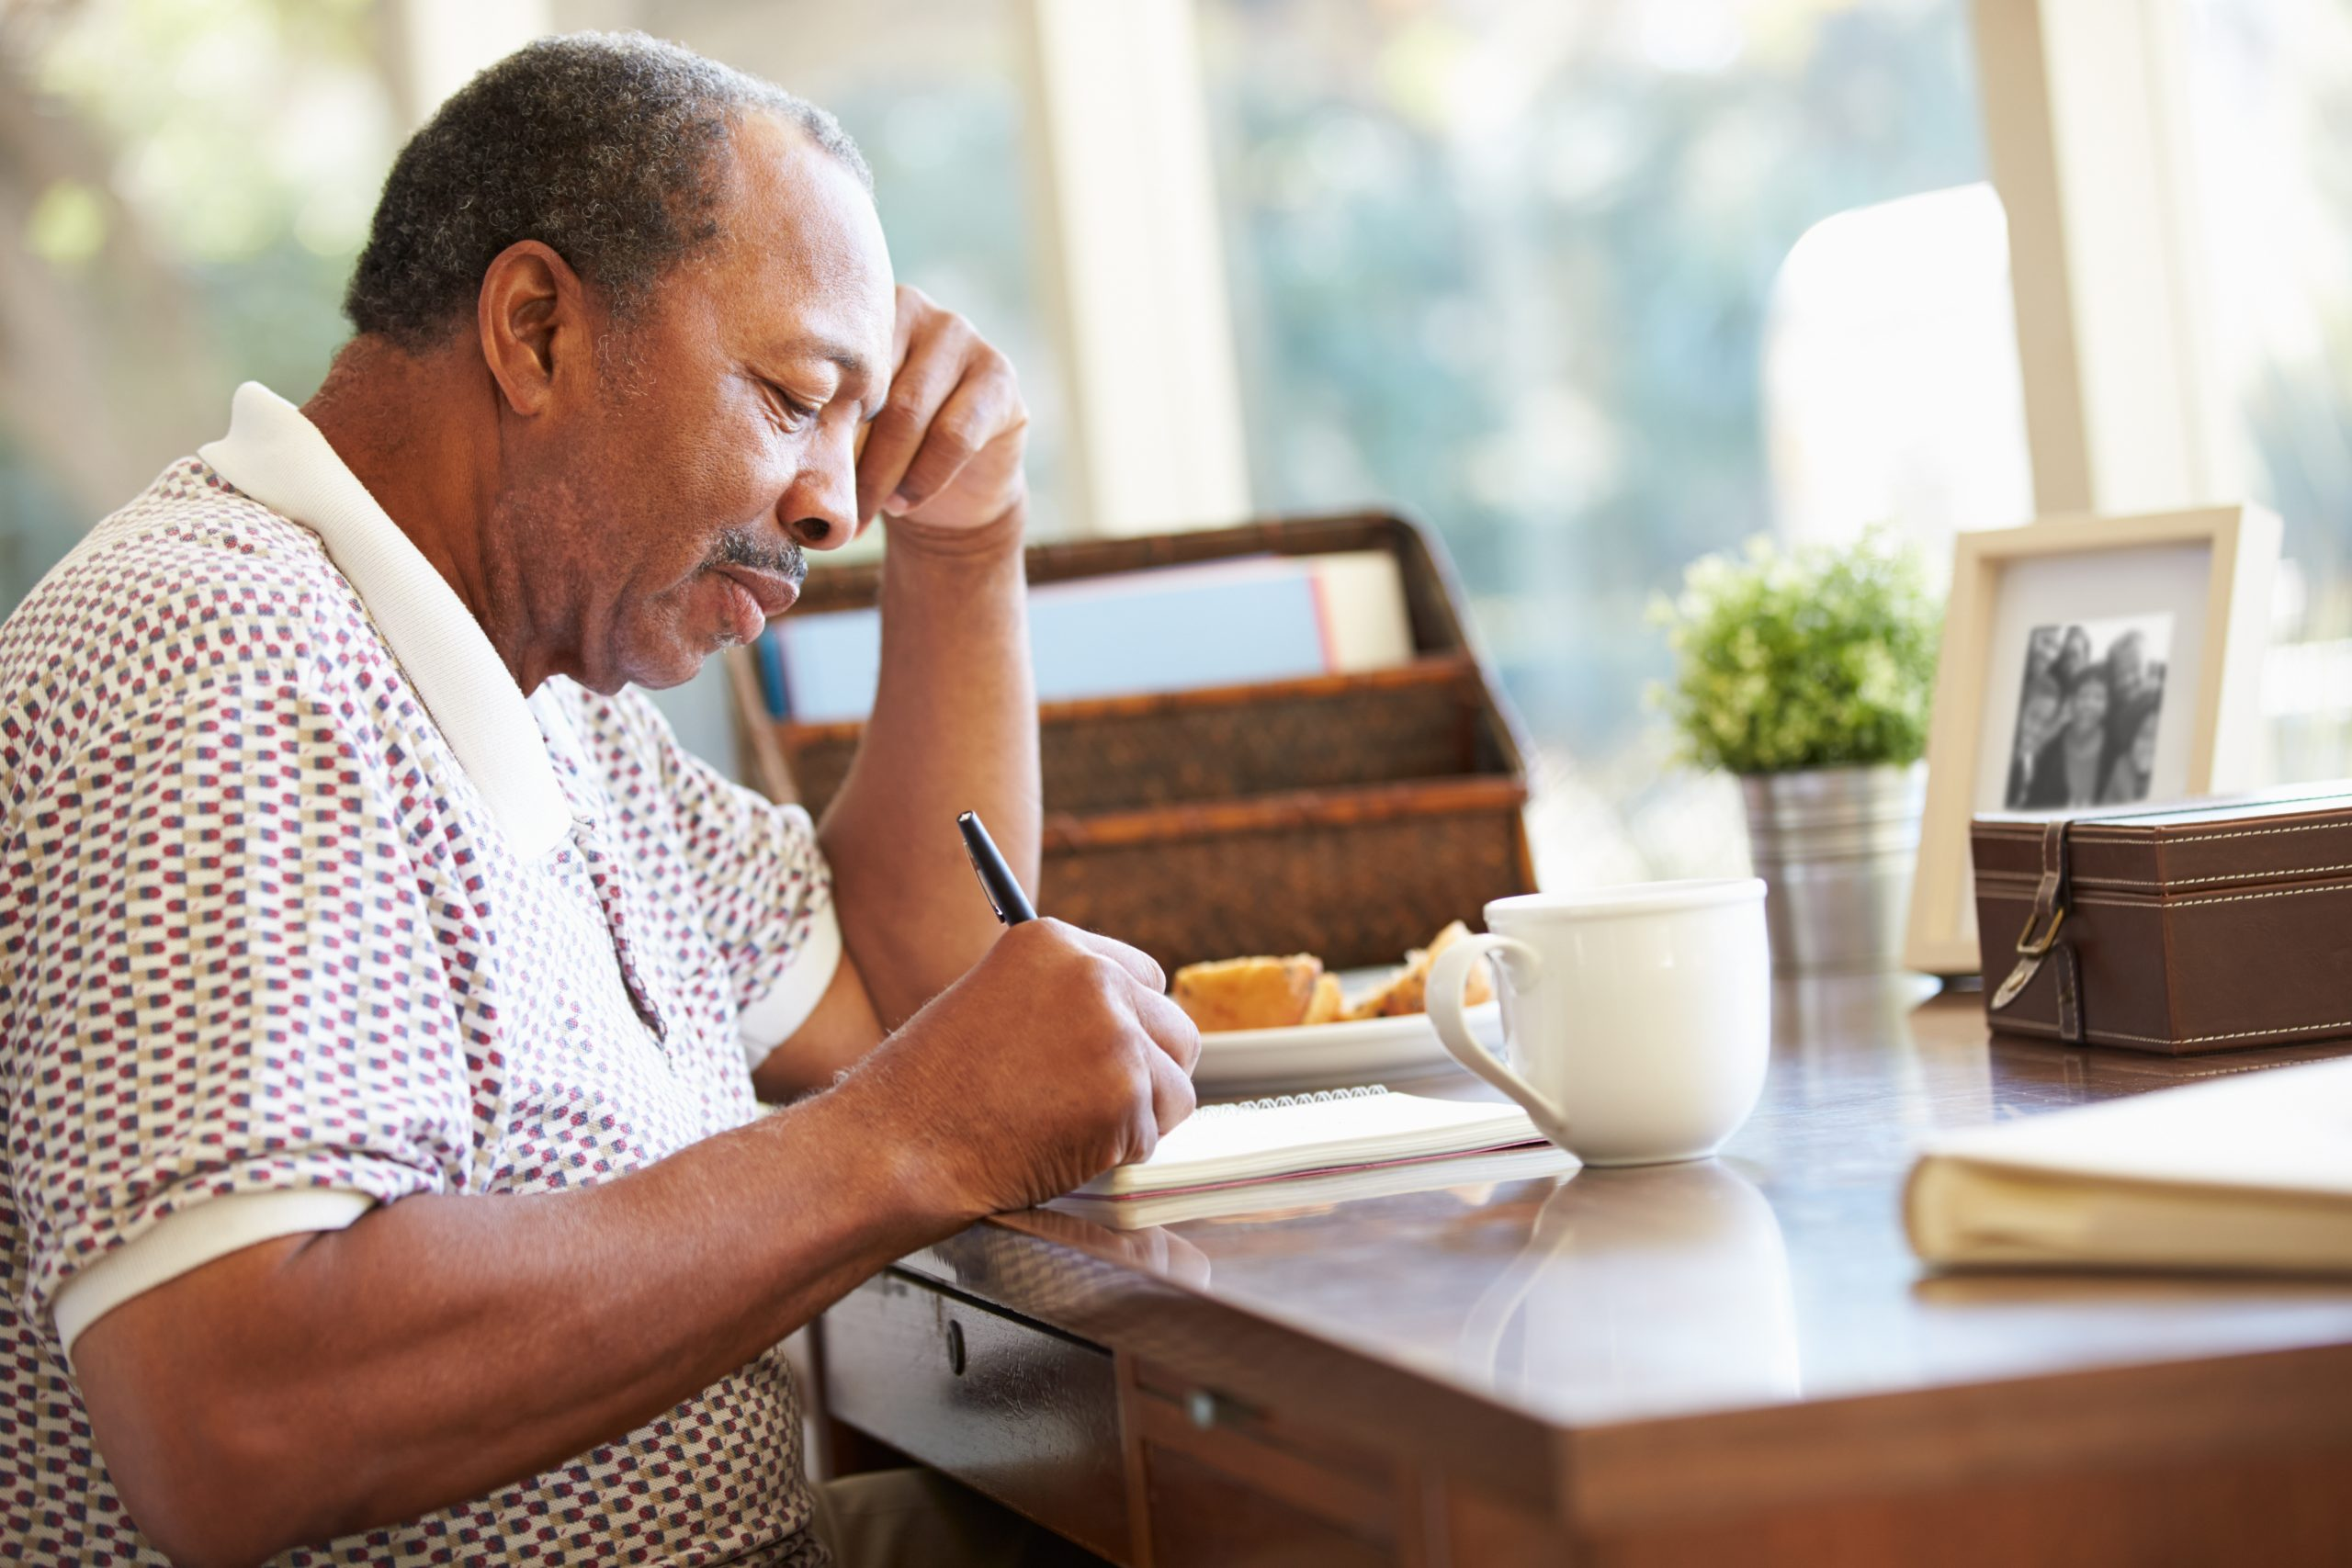 Senior man sitting at table writing his autobiography